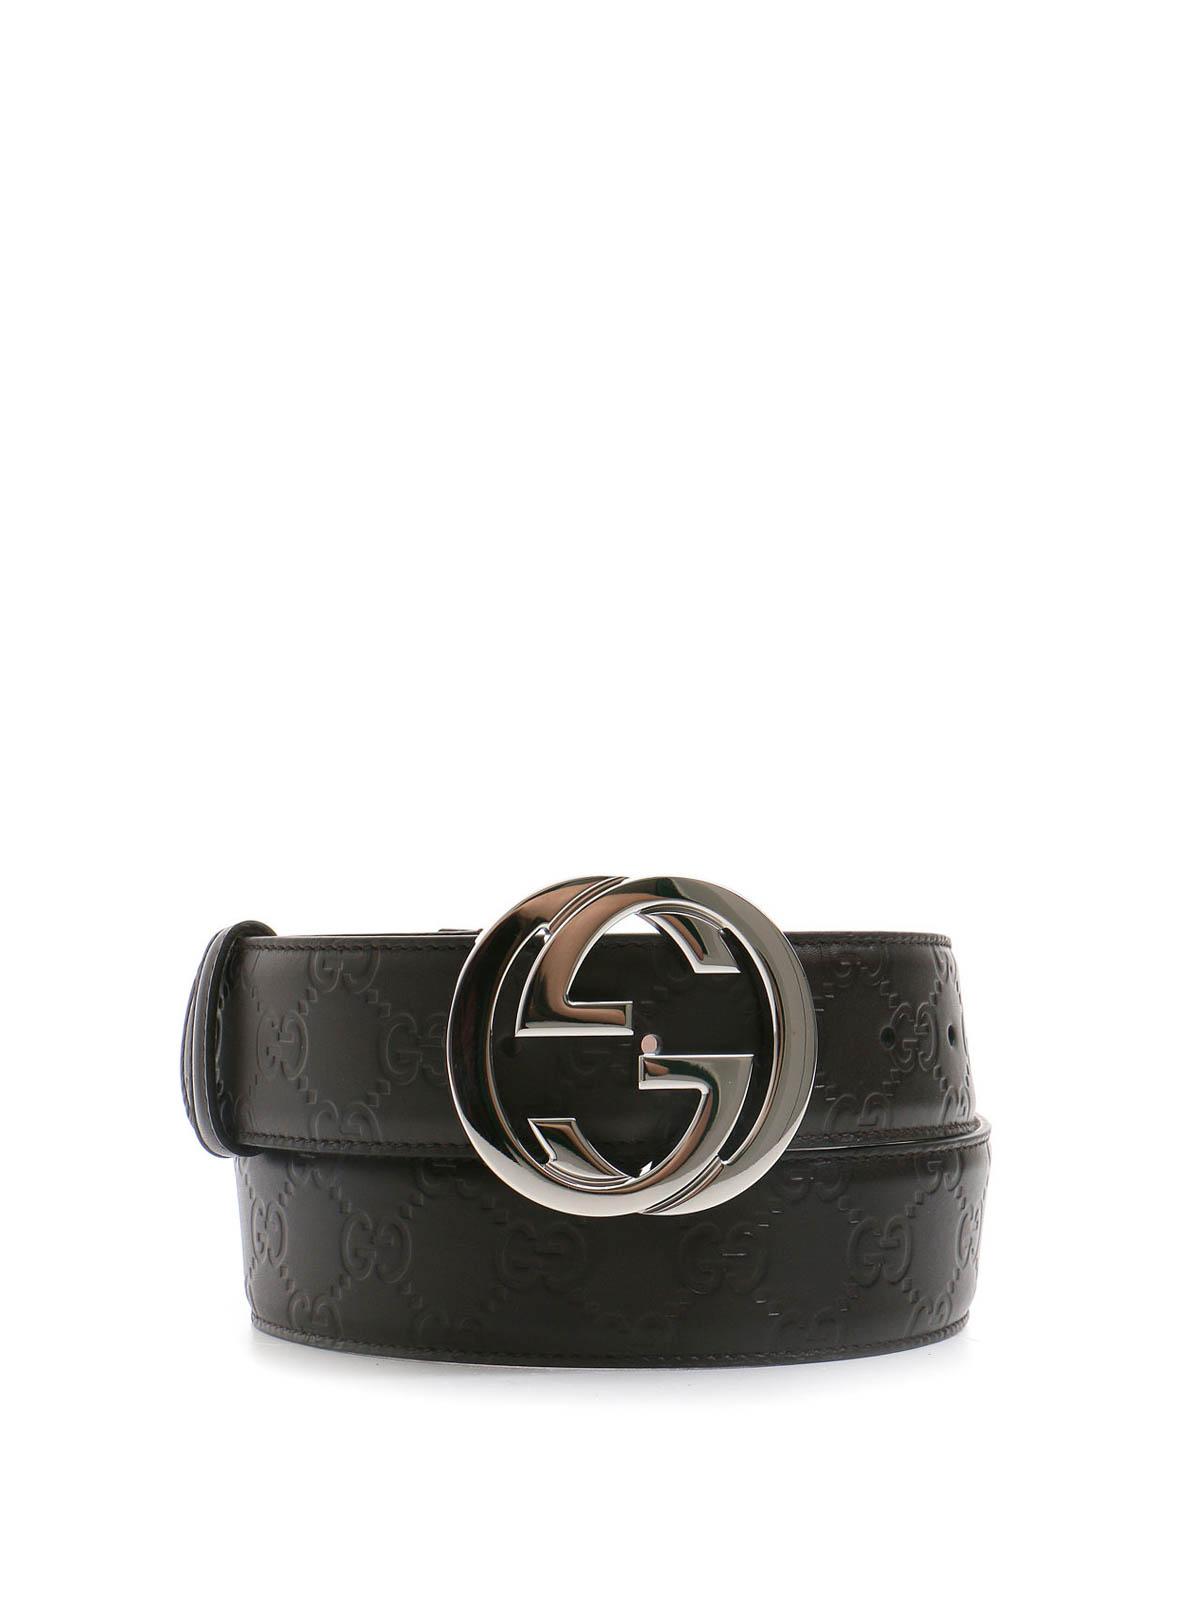 Gucci - Interlocking GG leather belt - belts - 411924 CWC1 ...